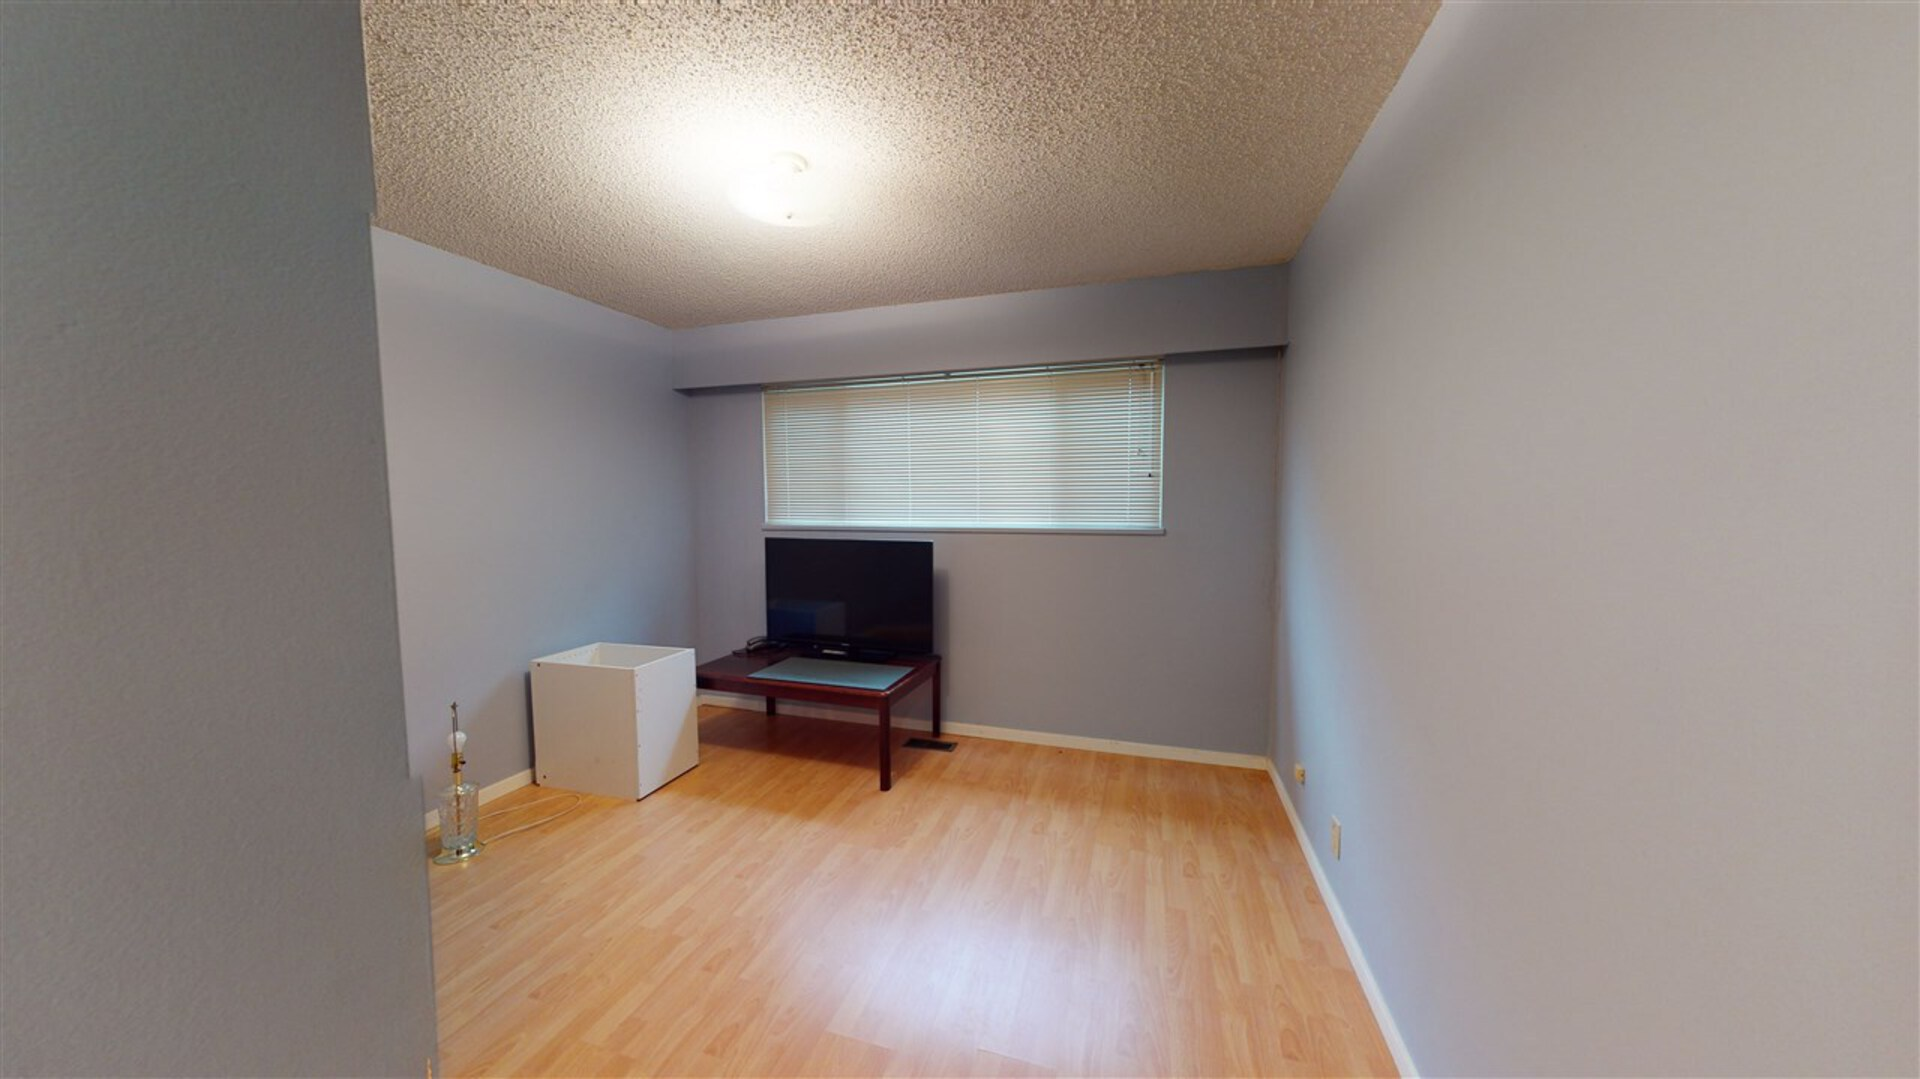 65-e-39th-avenue-main-vancouver-east-22 at 65 East 39th Avenue, Main, Vancouver East